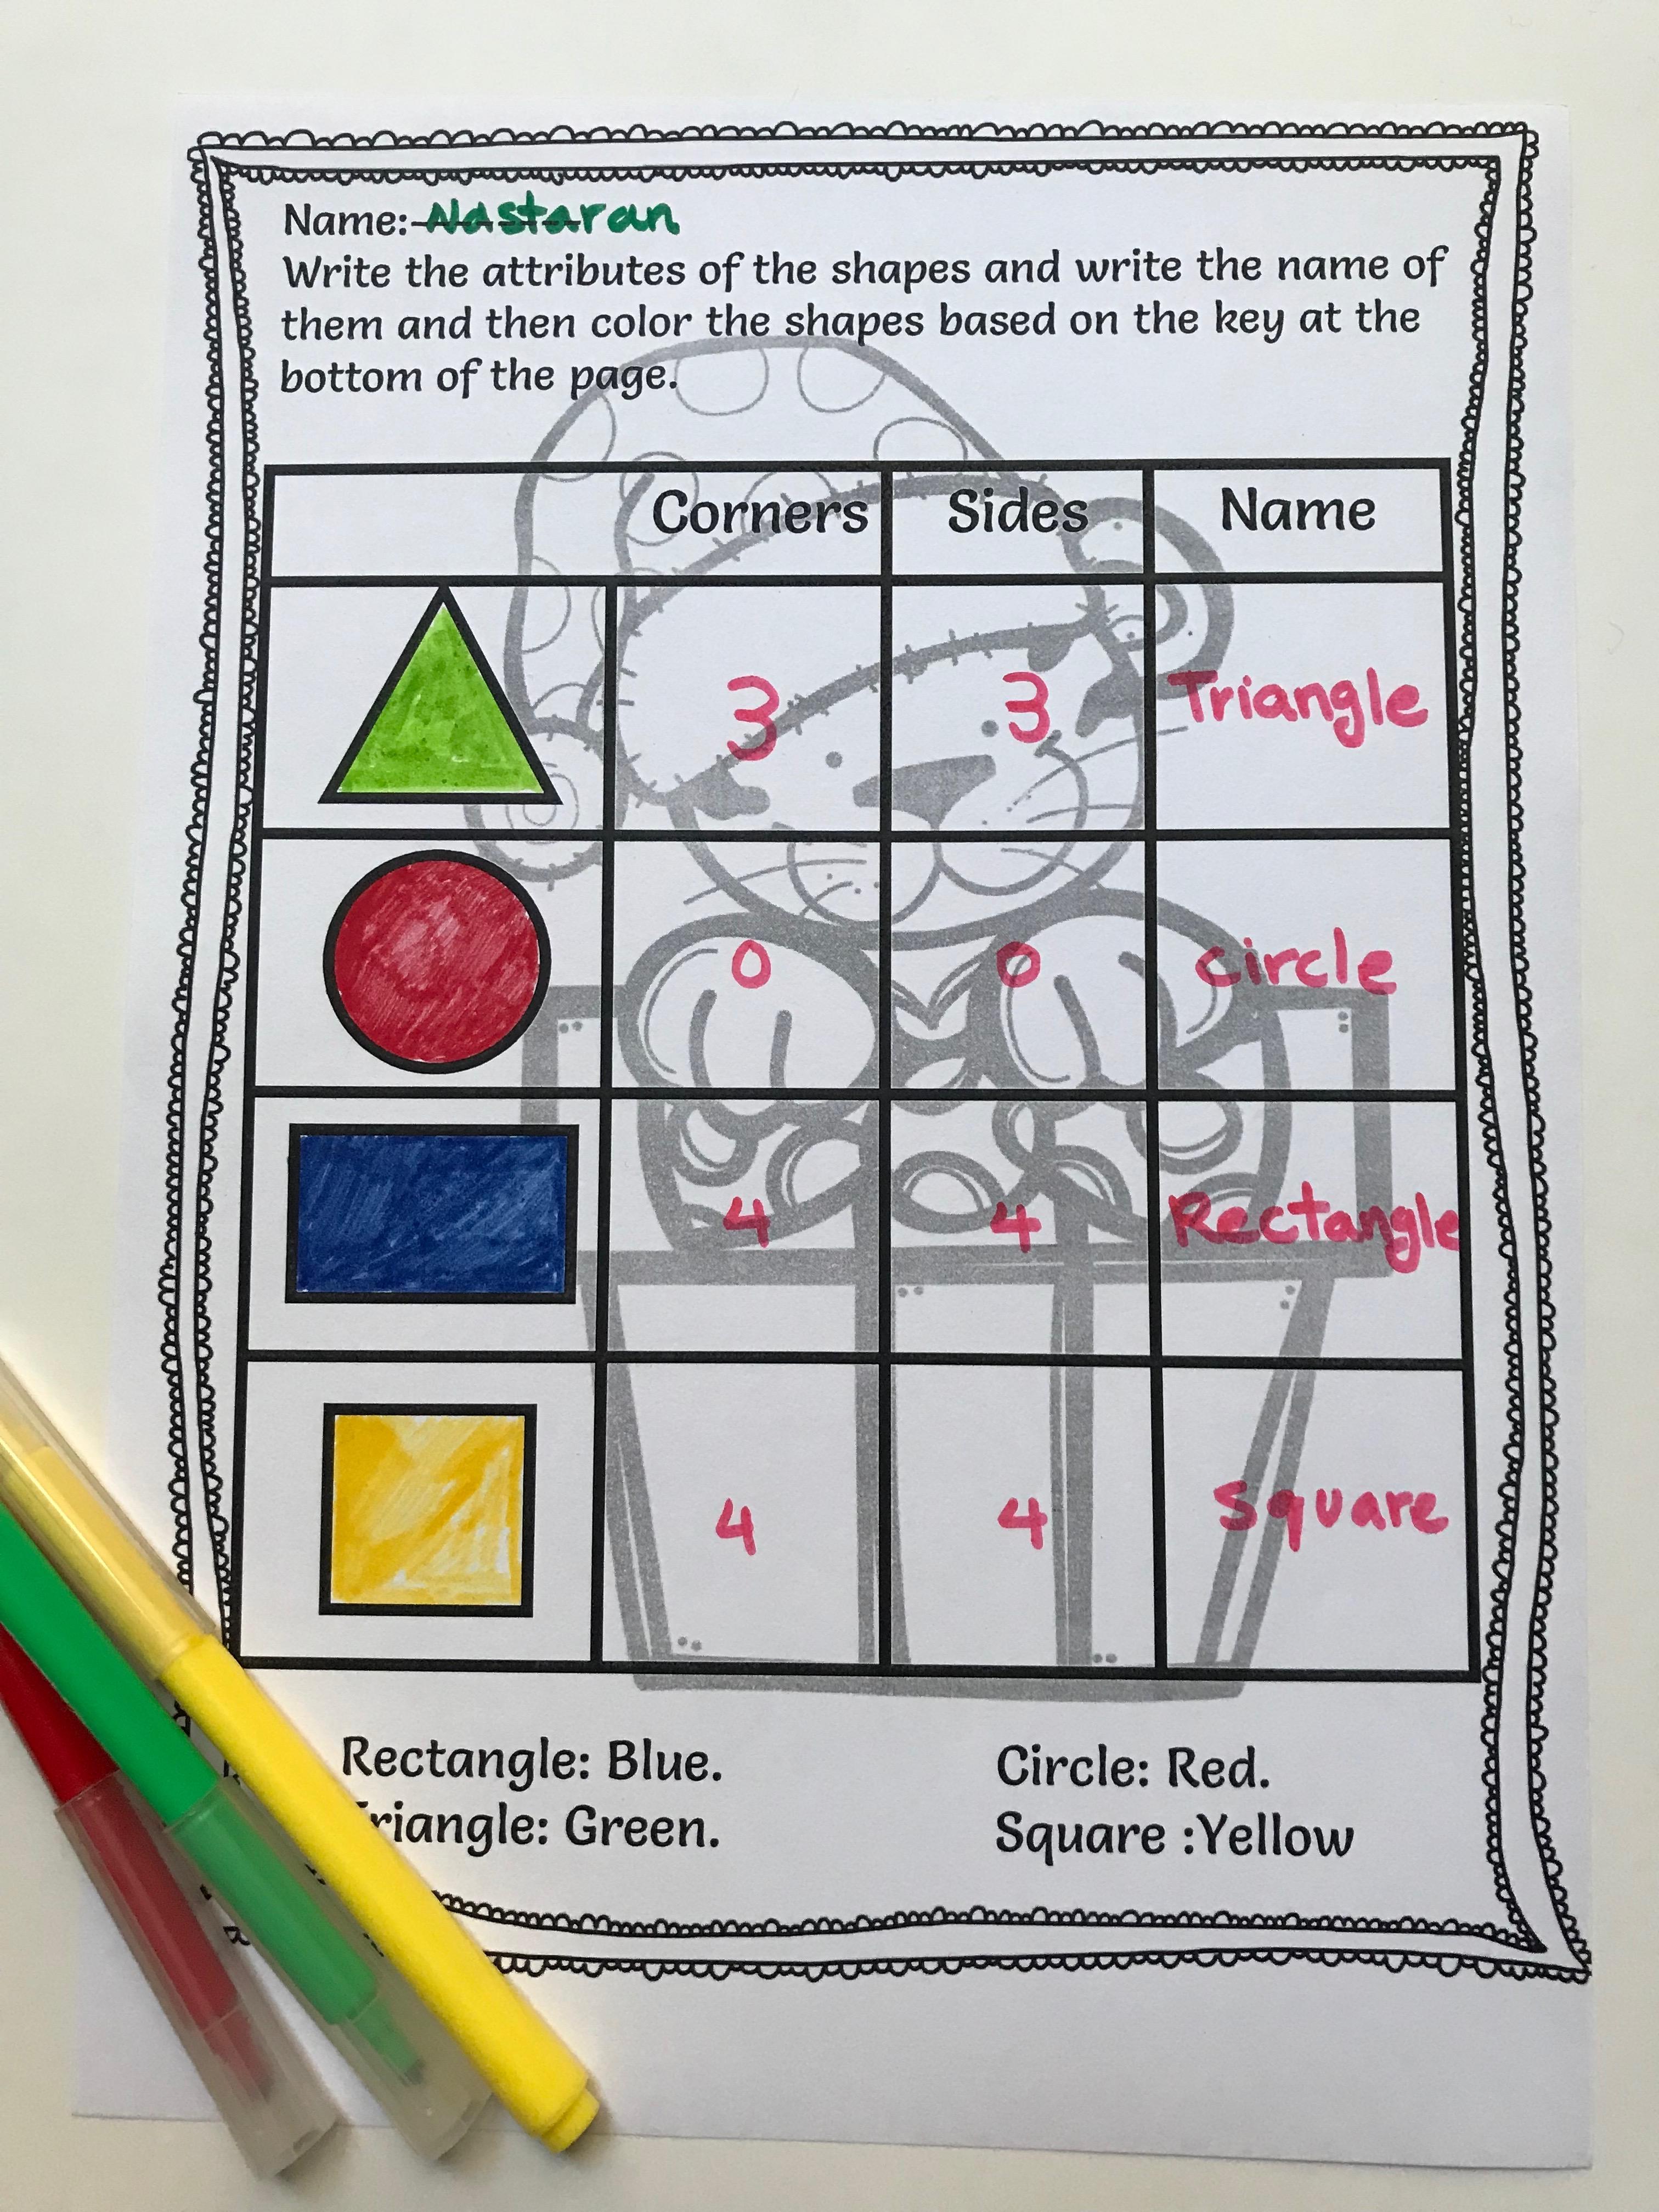 Christmas Math Worksheets 1st Grade Gt Nastaran S Resources